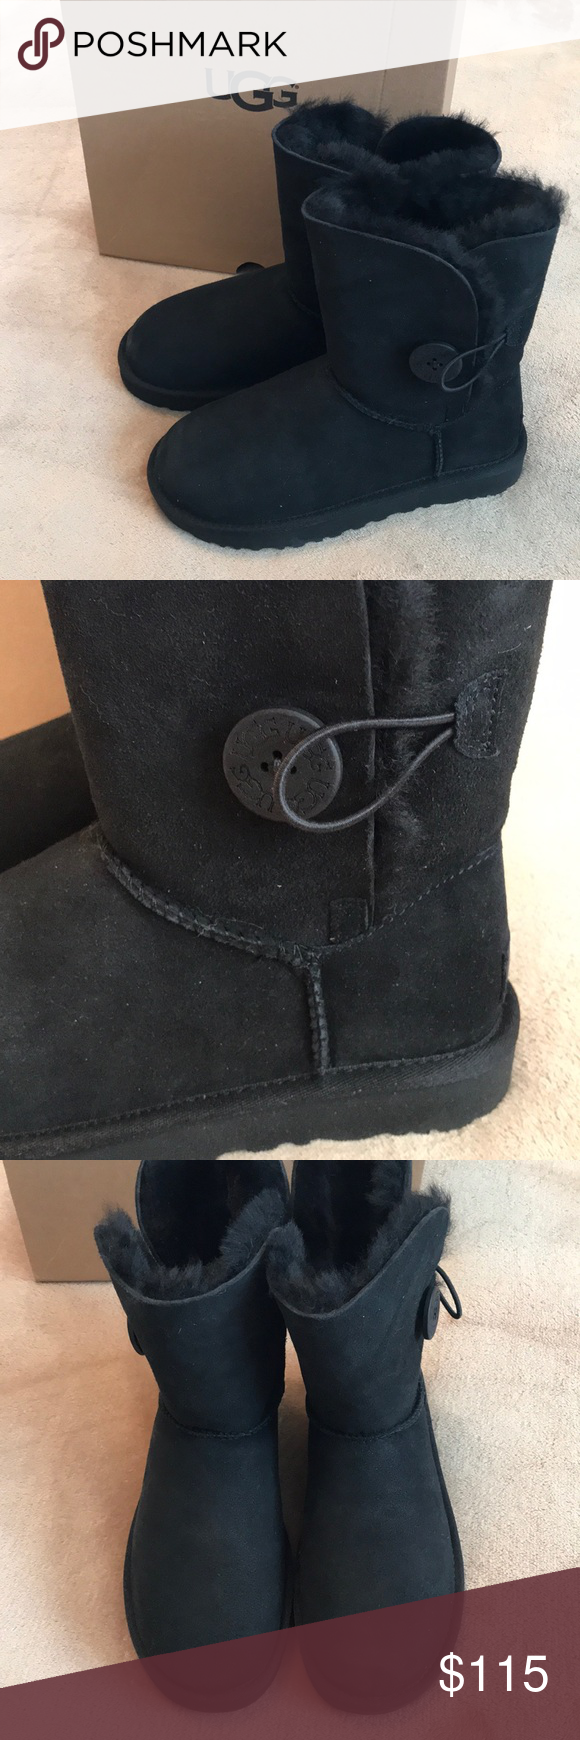 HOST PICK 🎉 NIB UGG Bailey Button black boots Ugg bailey